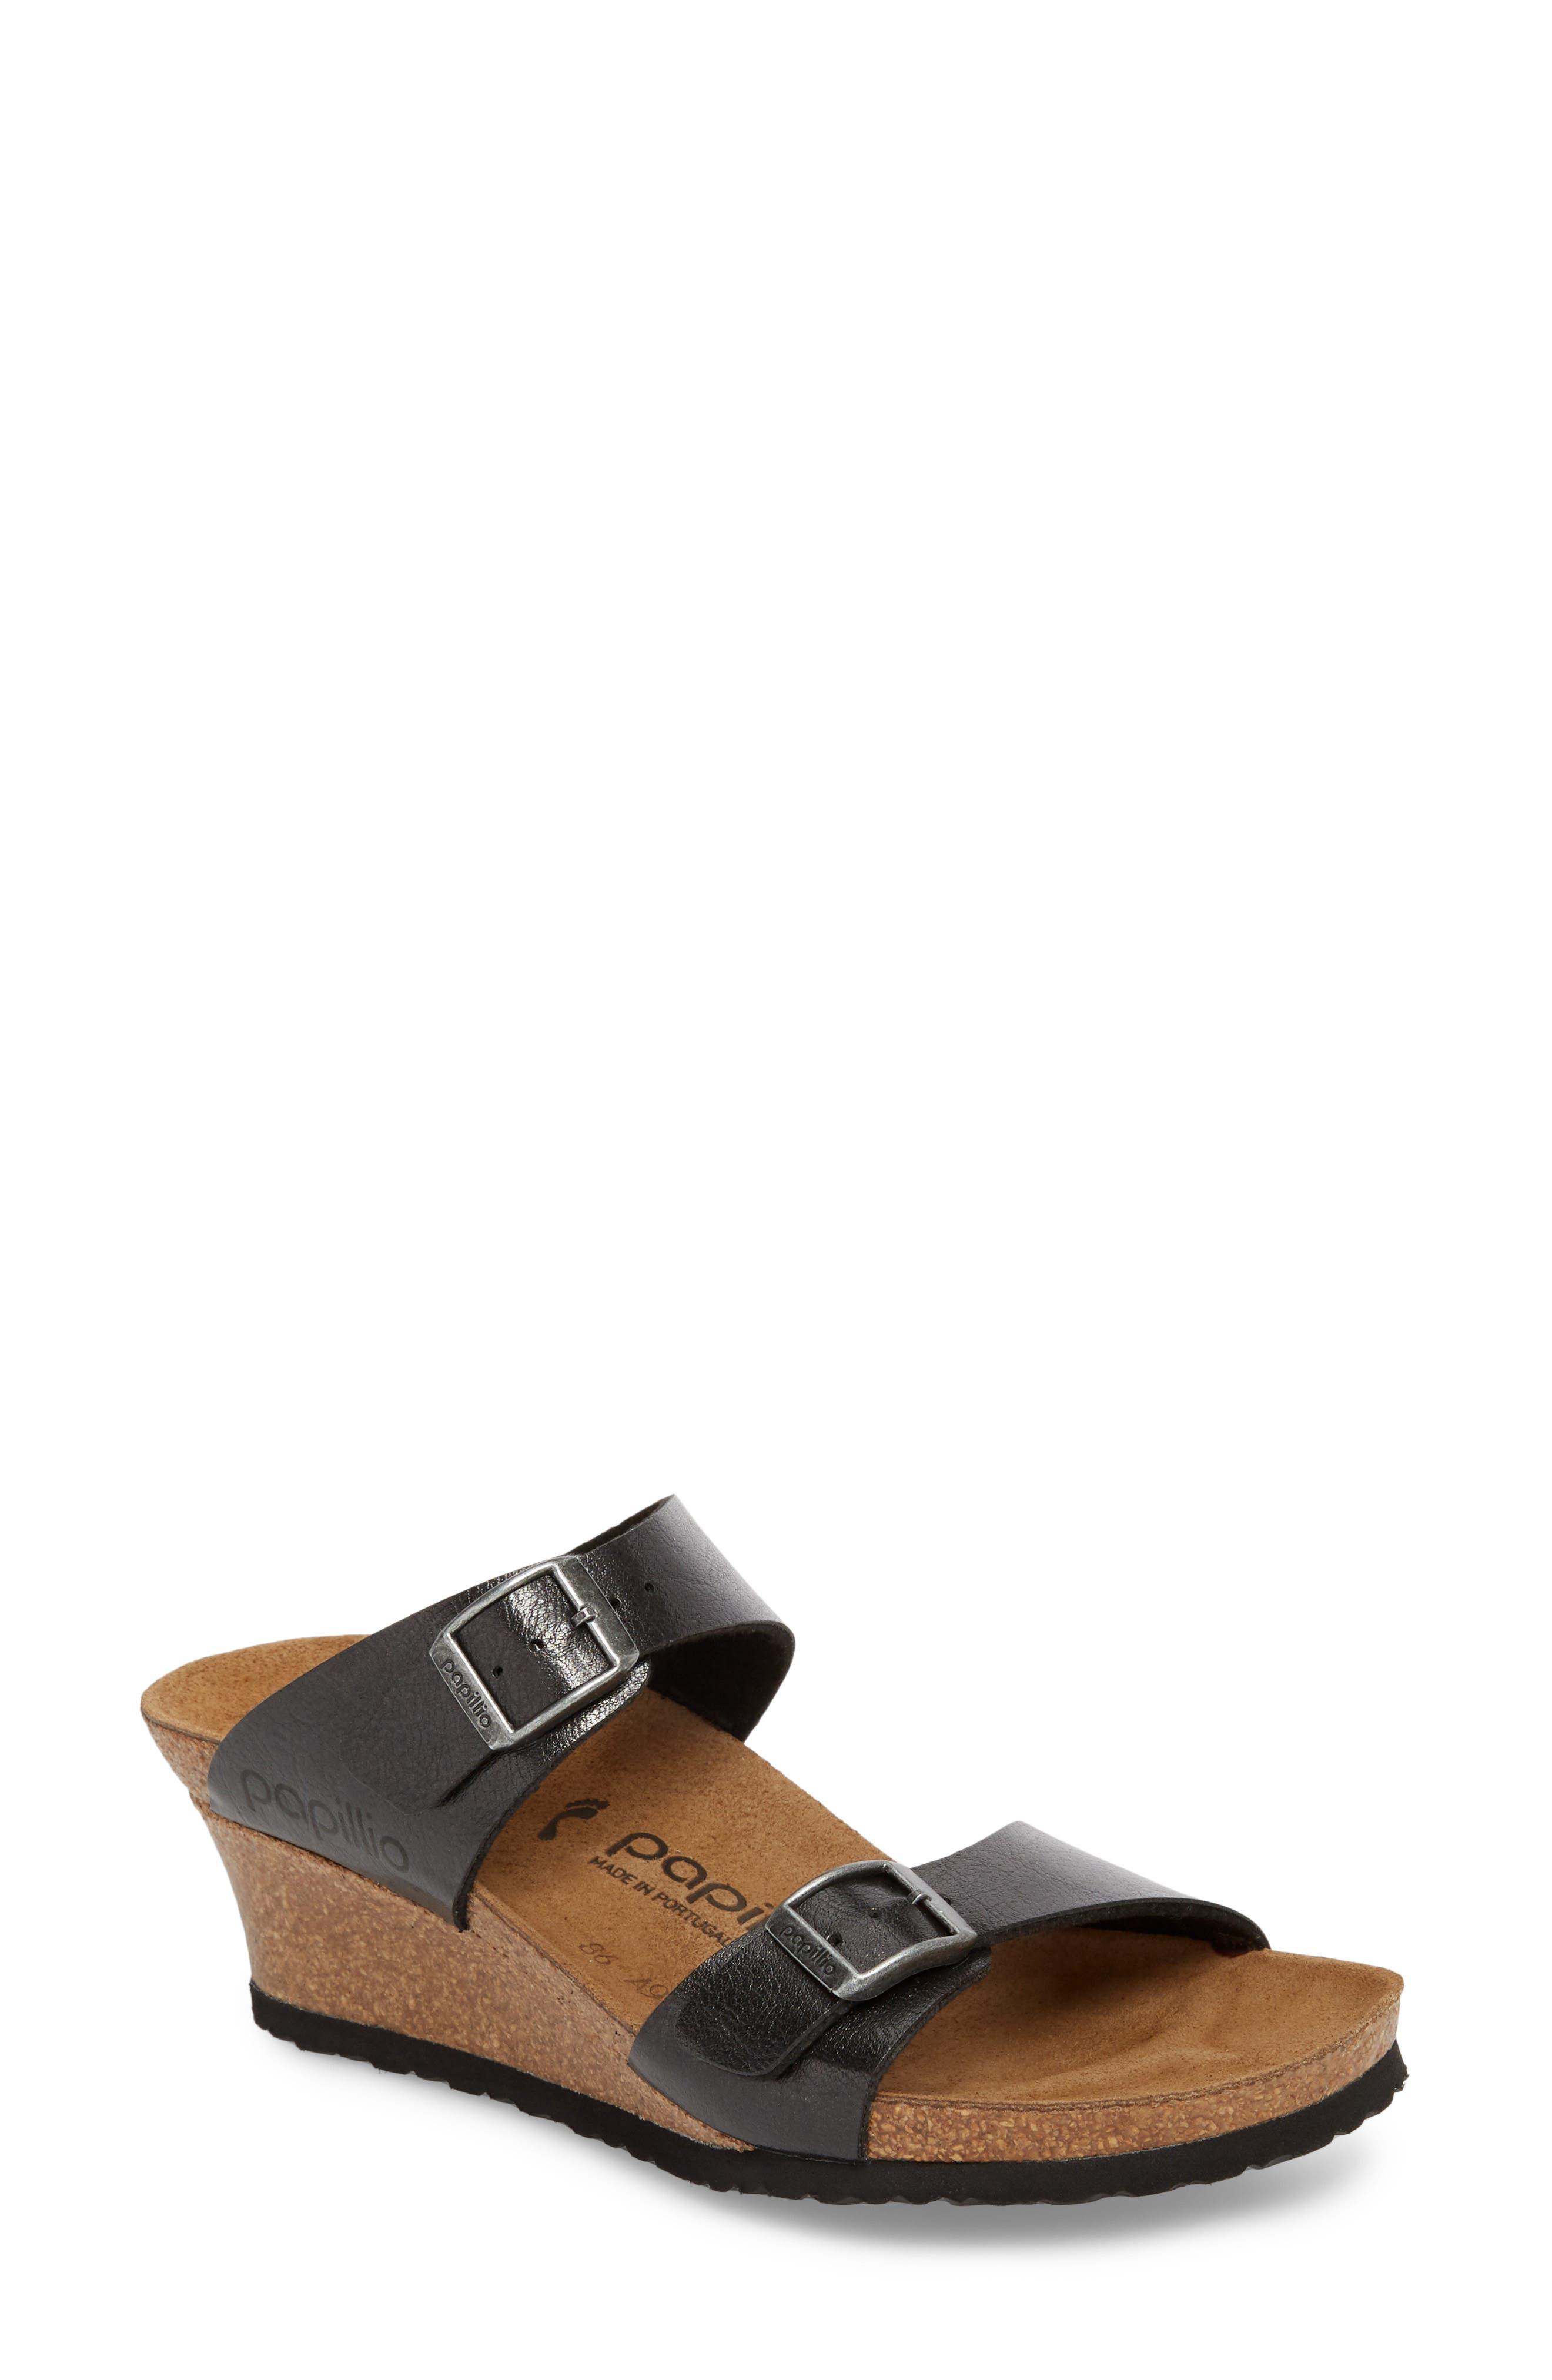 Papillio by Birkenstock Dorothy Wedge Slide Sandal,                             Main thumbnail 1, color,                             Graceful Licorice Leather